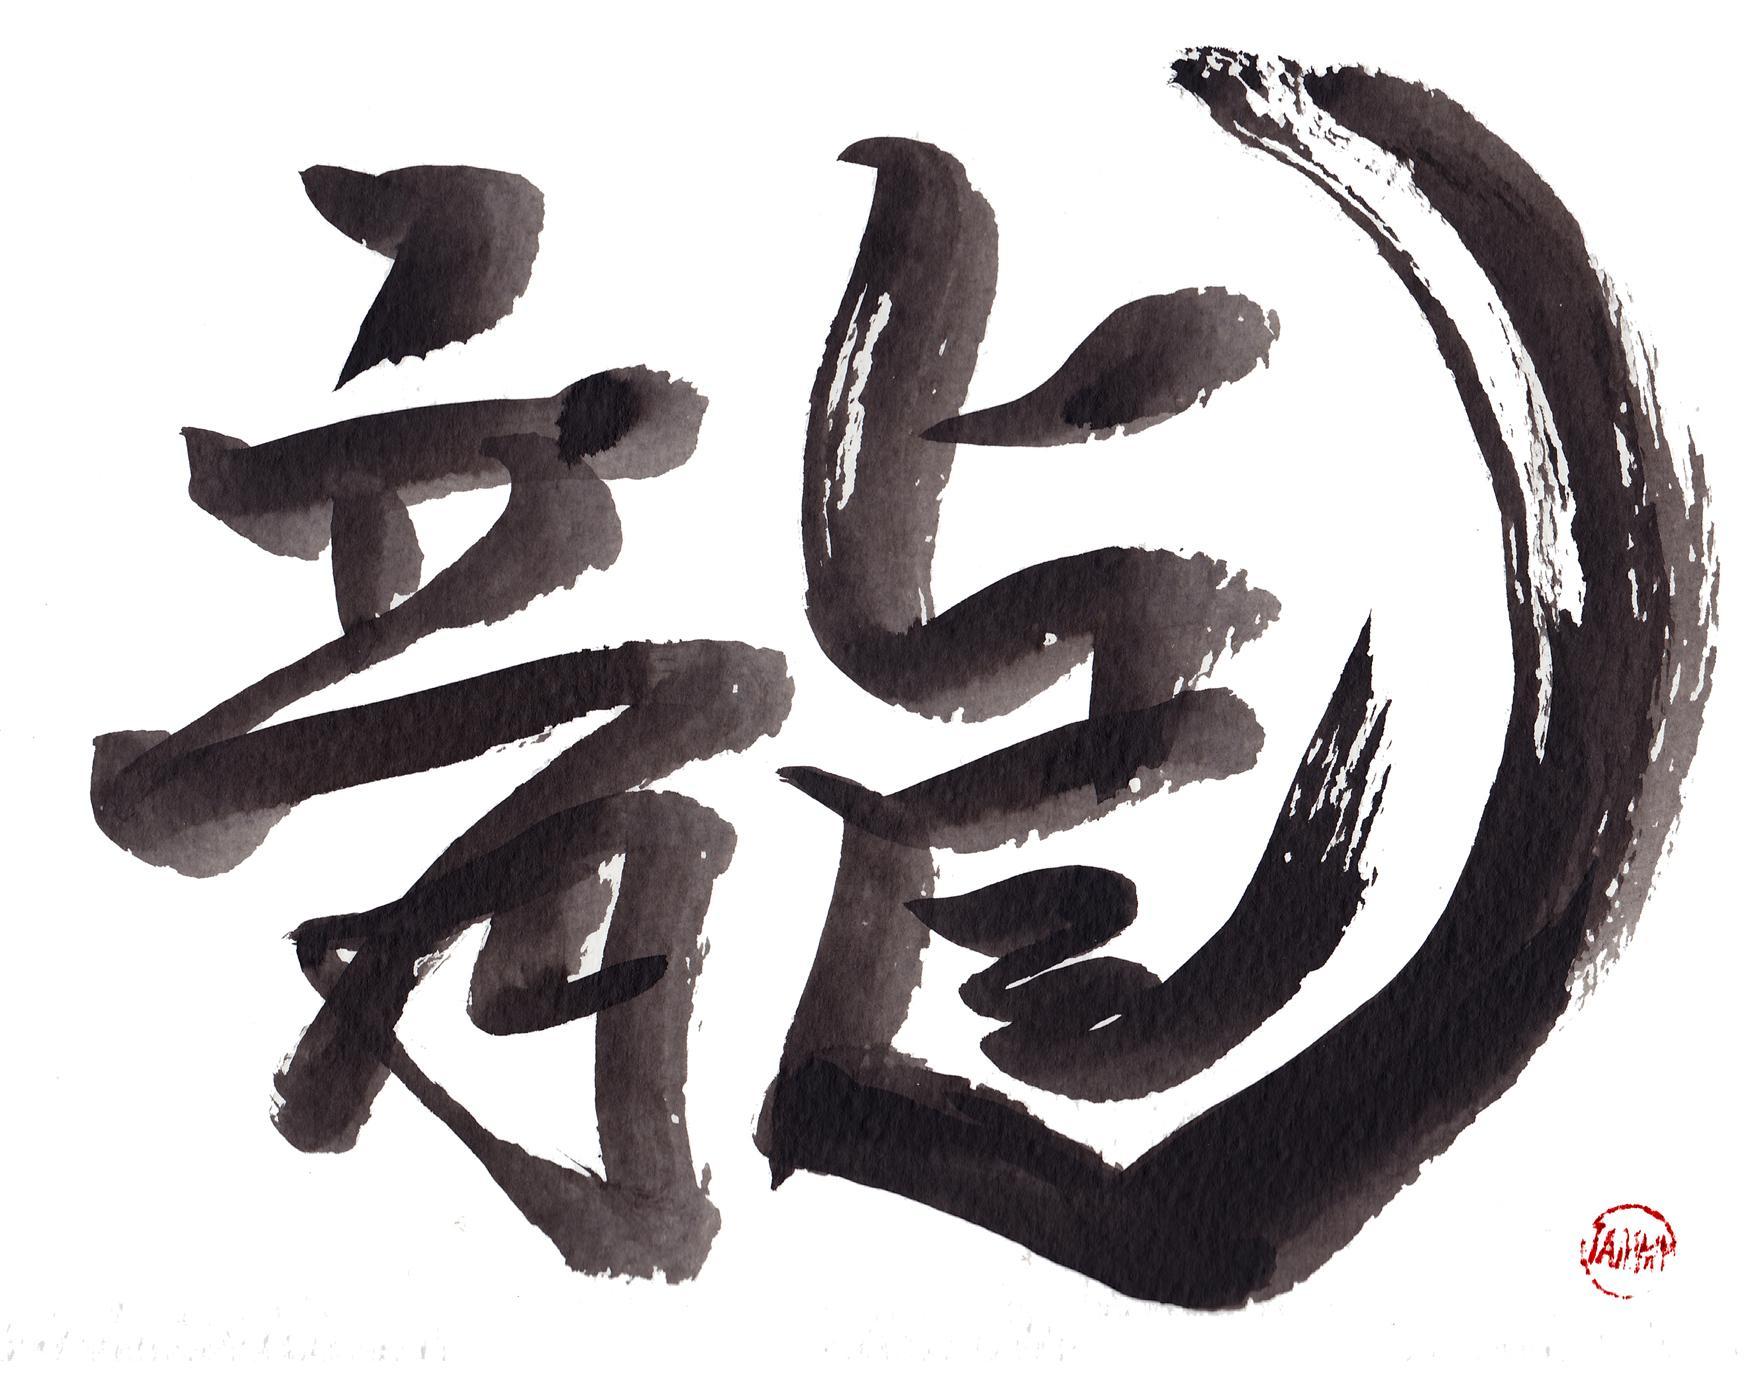 Inked Cartoons Calligraphy Skillshare Projects